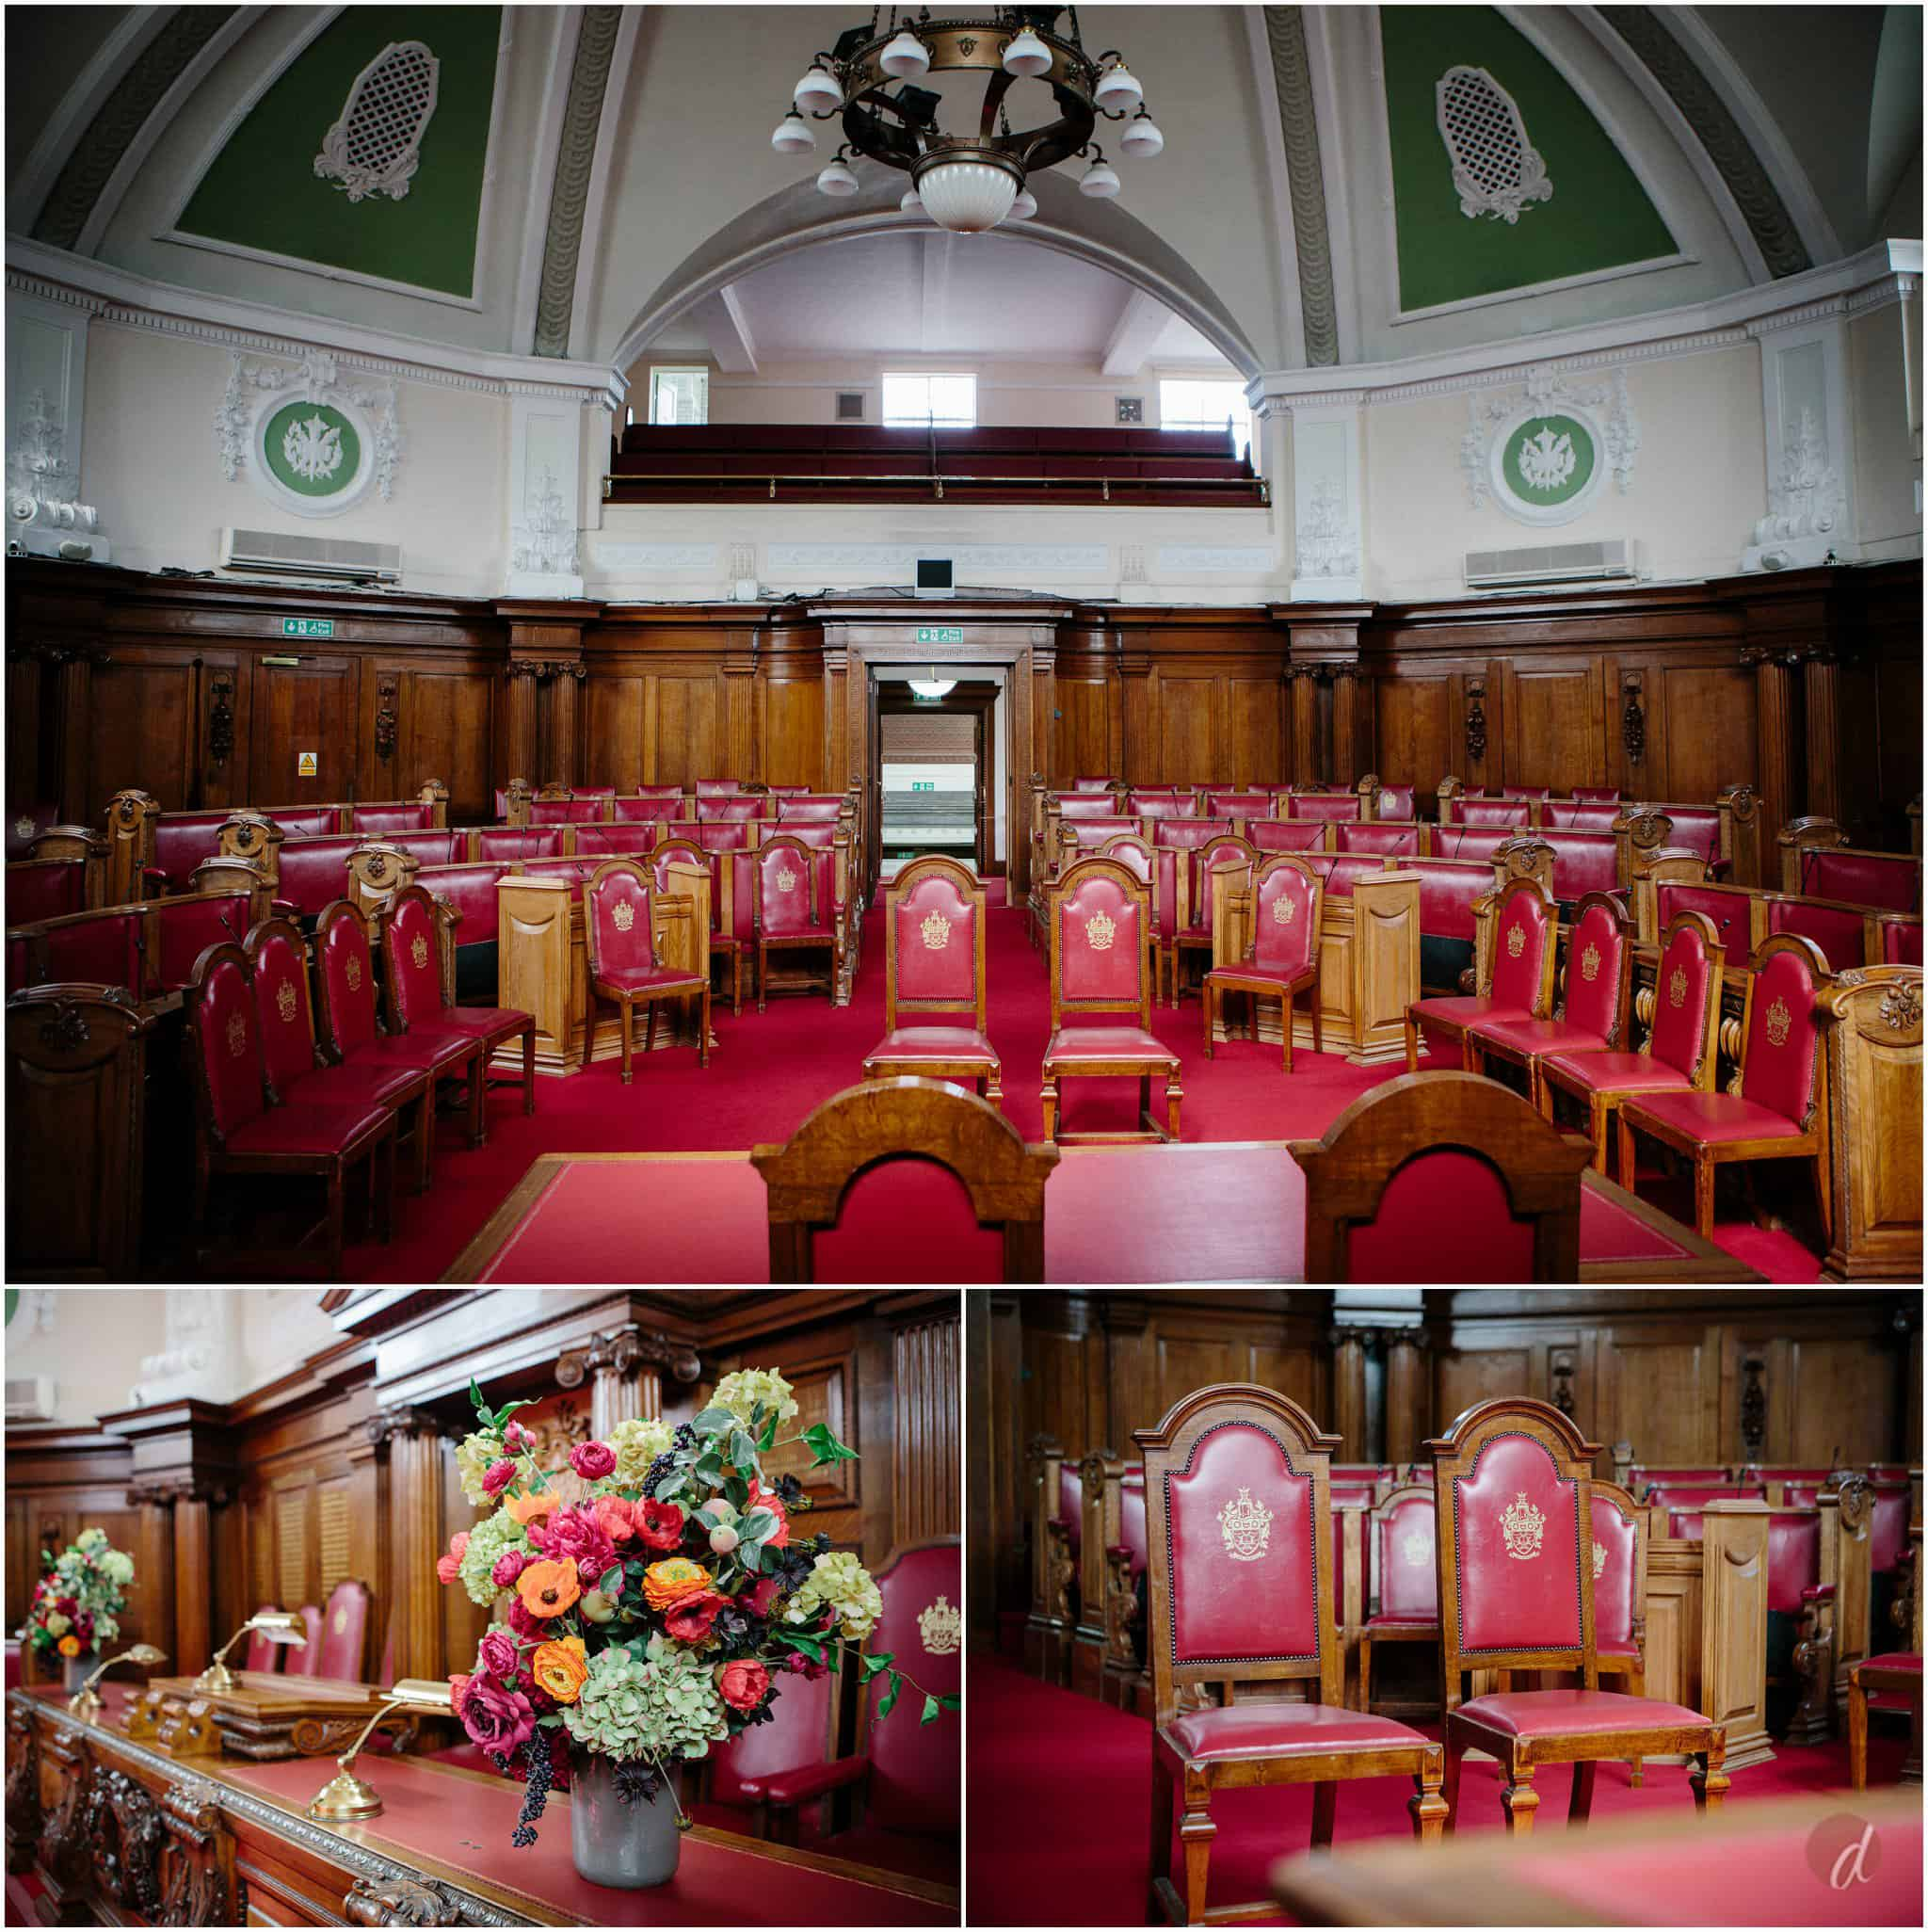 islilngton town hall council chamber wedding